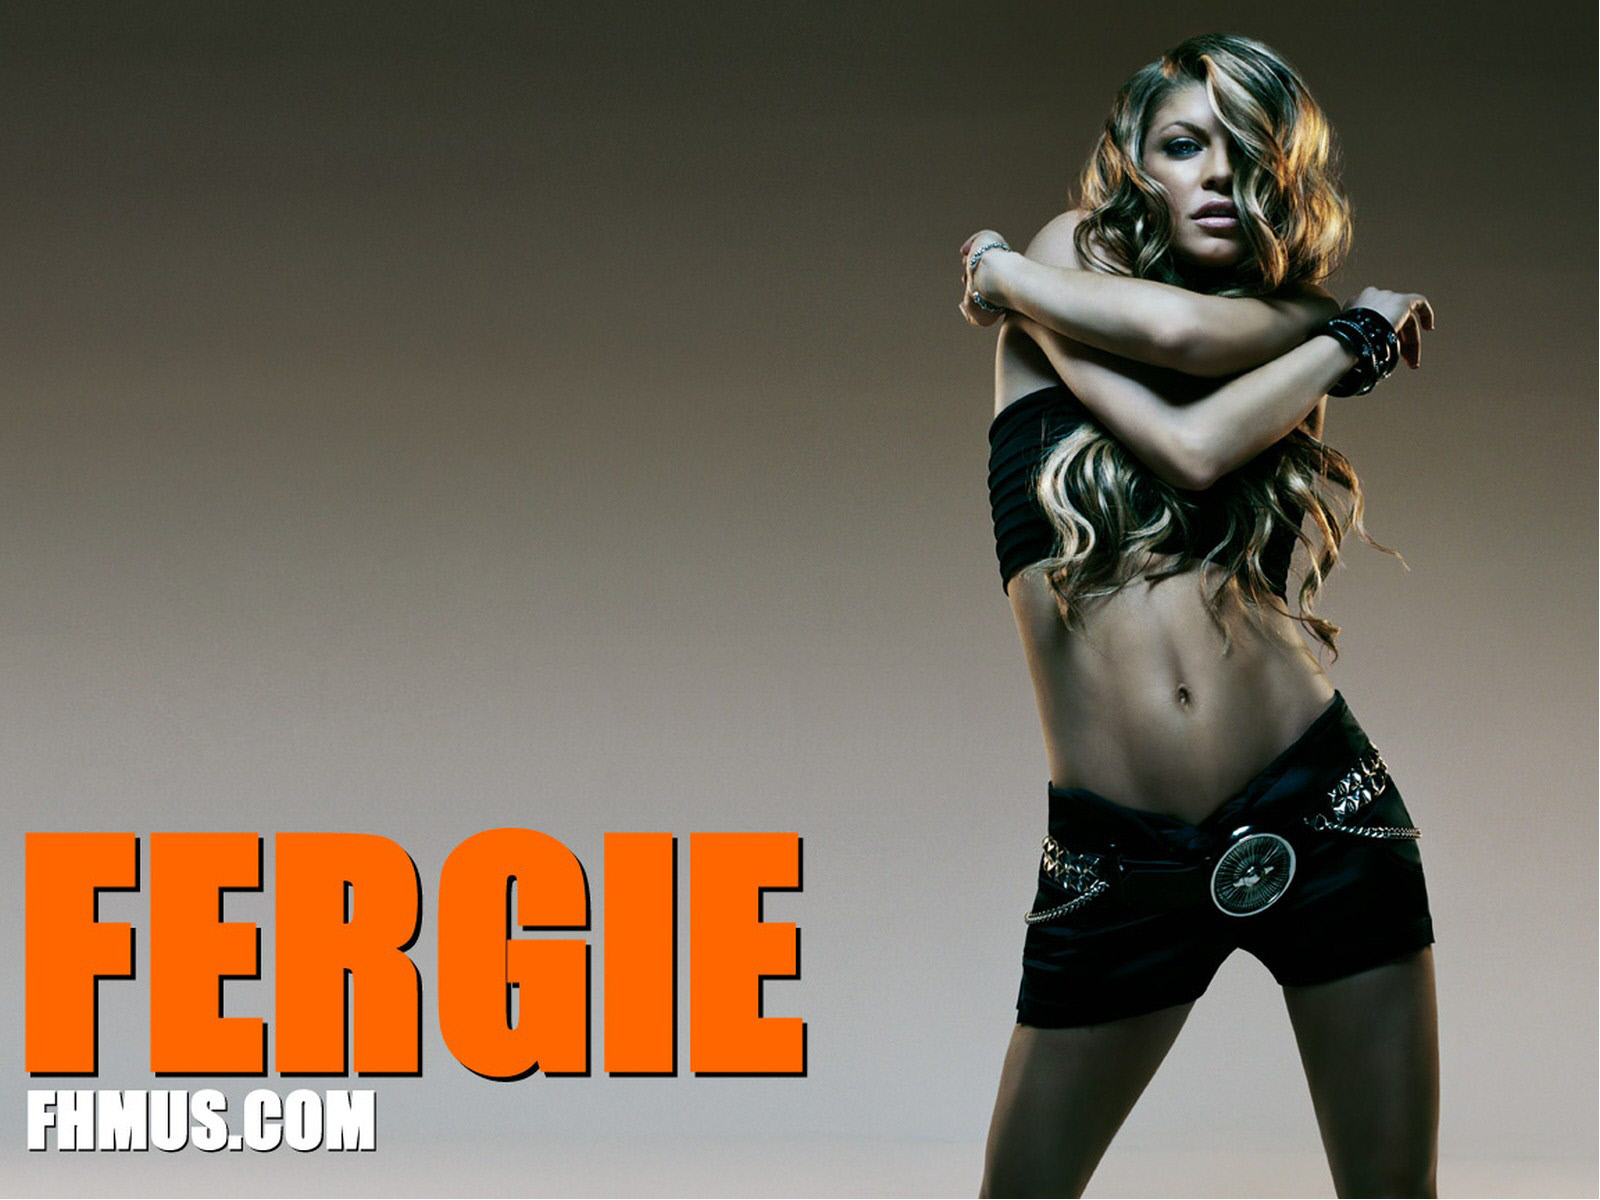 http://4.bp.blogspot.com/-_ulPkuLJVds/TZosXrdFDuI/AAAAAAAACMc/l-Kyi3JAWI4/s1600/Fergie%2BFHM%2BWallpaper.jpg